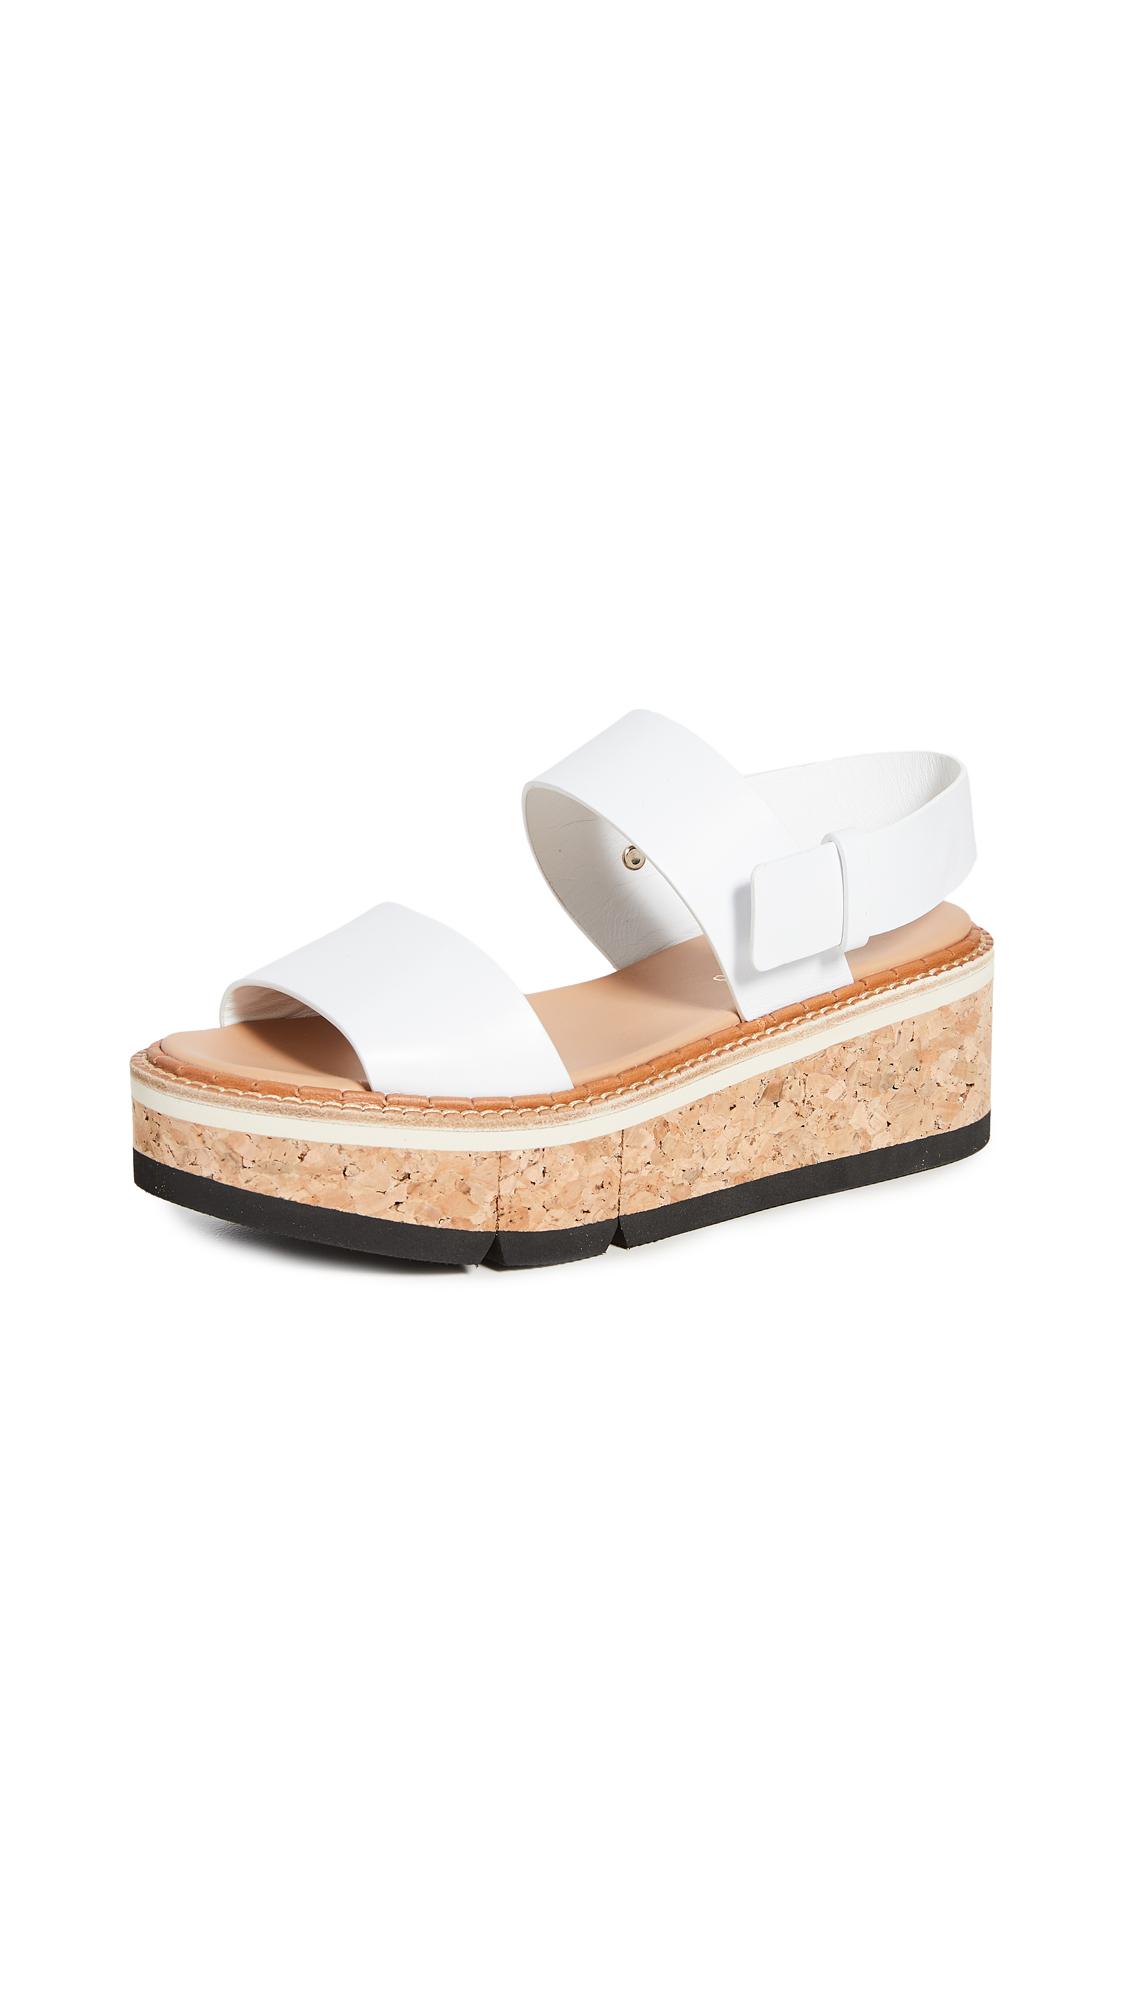 Paloma Barcelo Ivy Sandals - 50% Off Sale